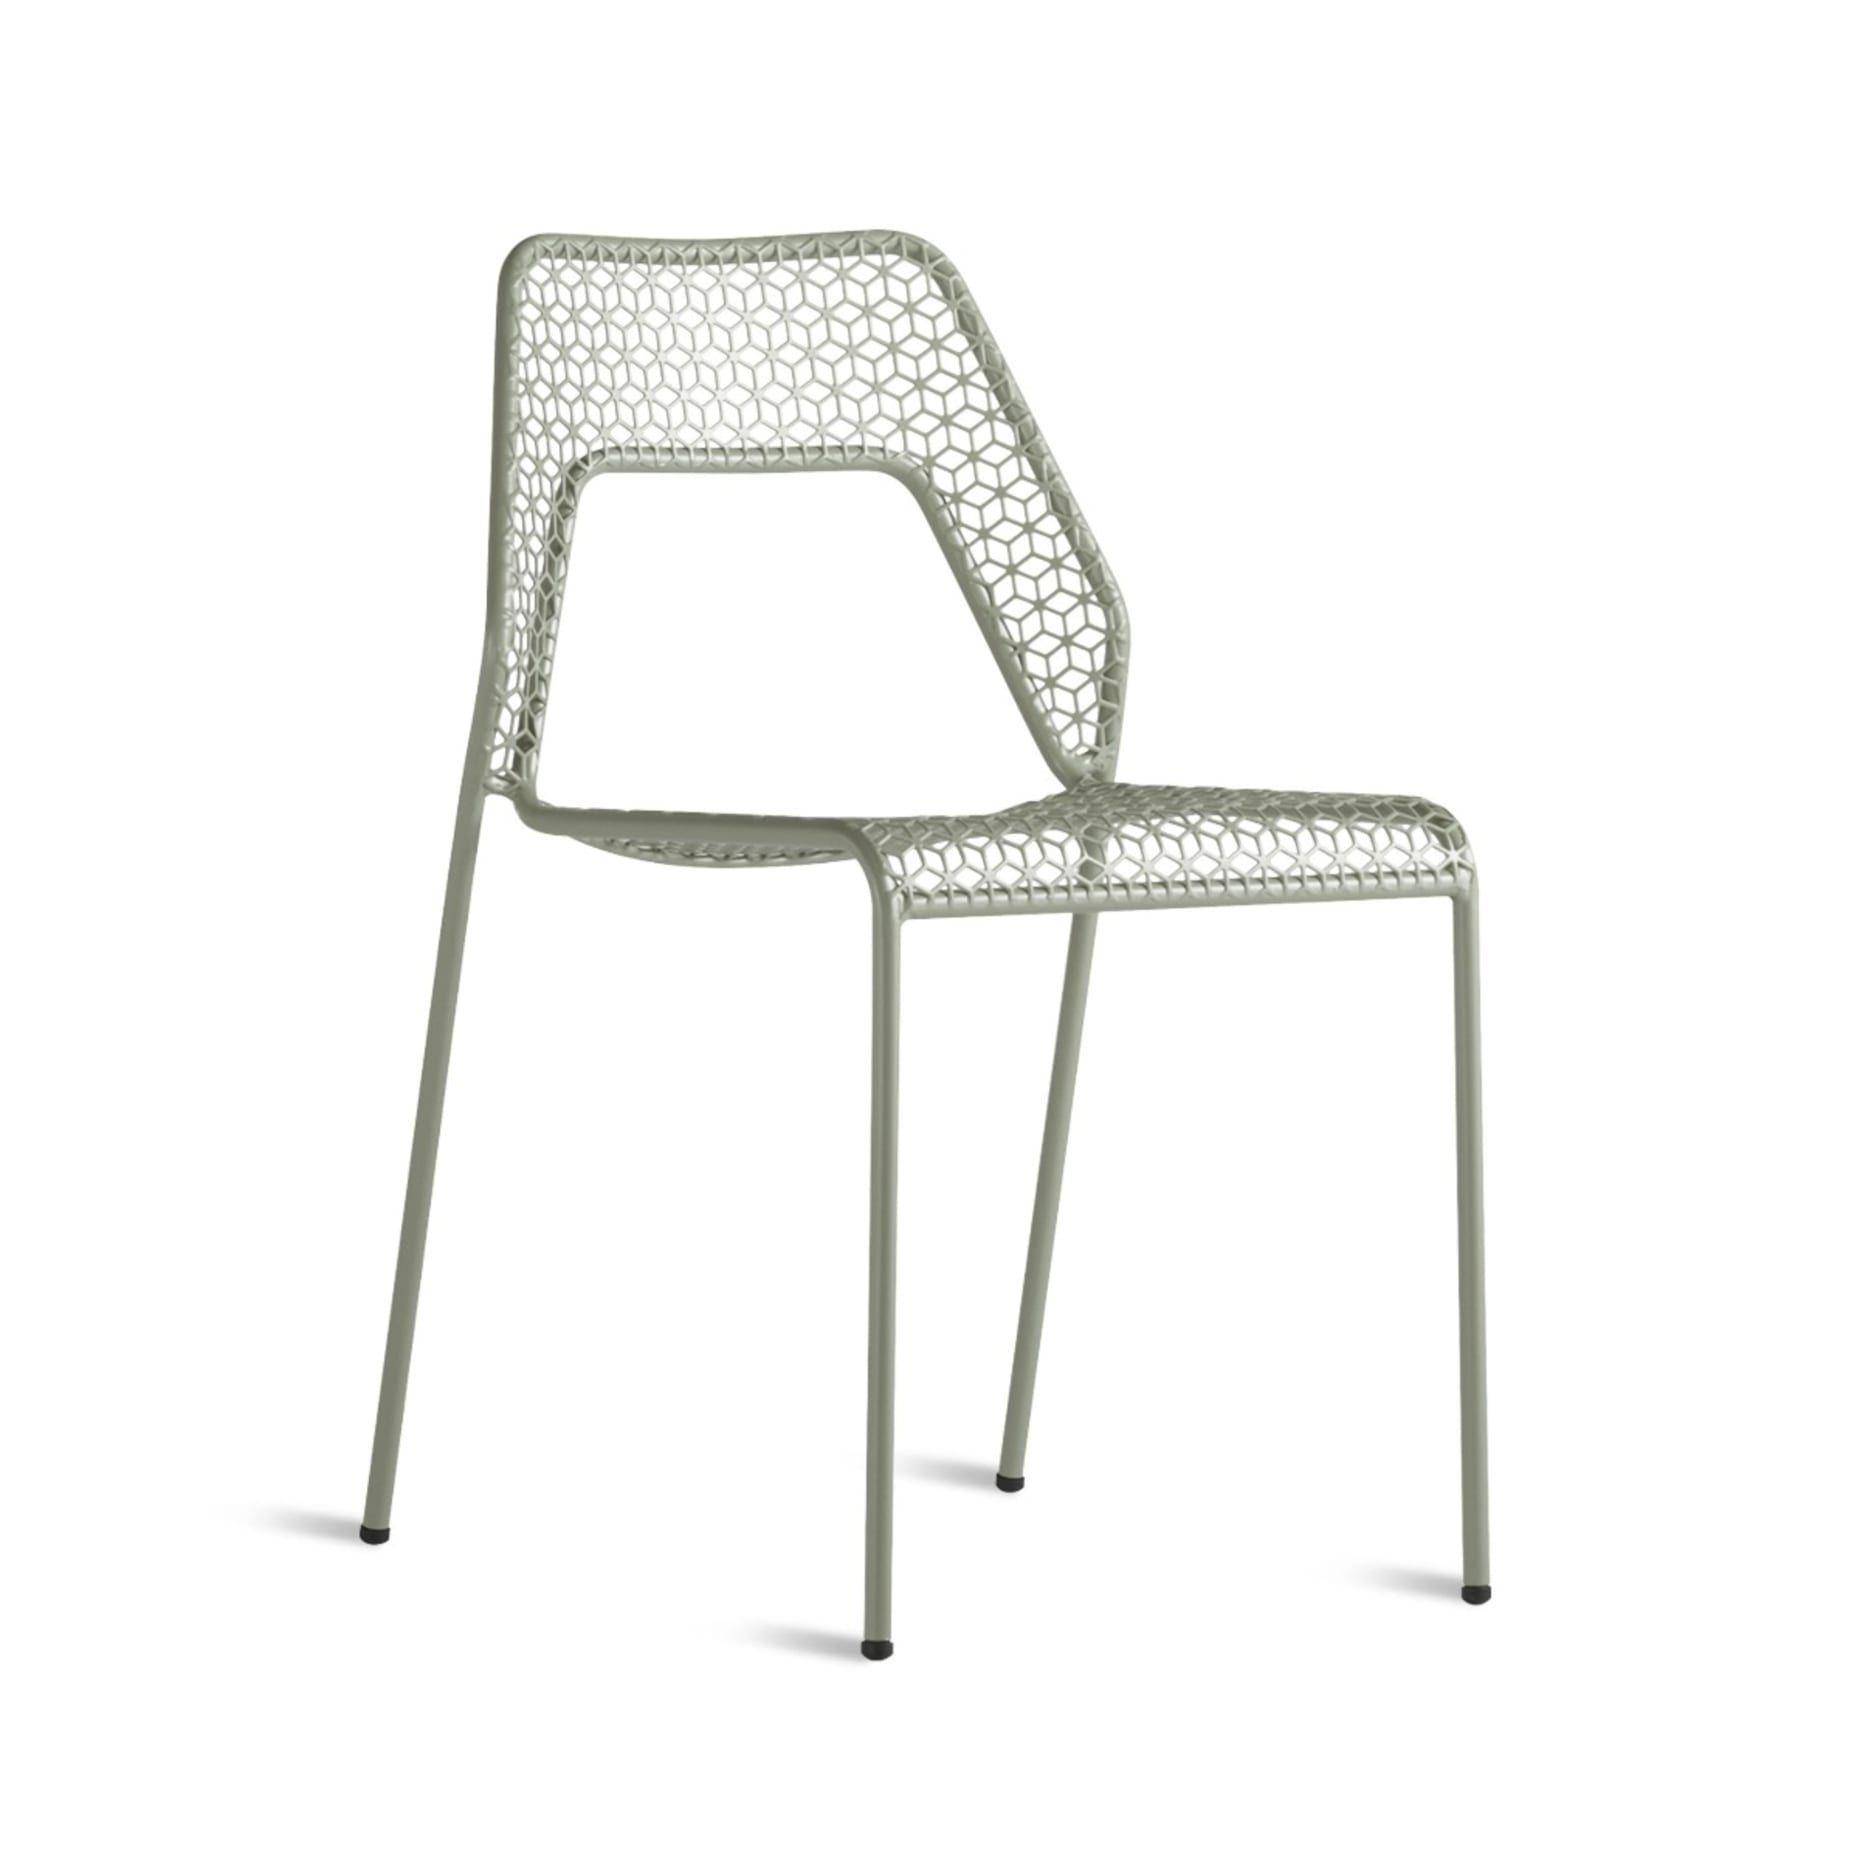 Hot Mesh Chair Metal Patio Chairs